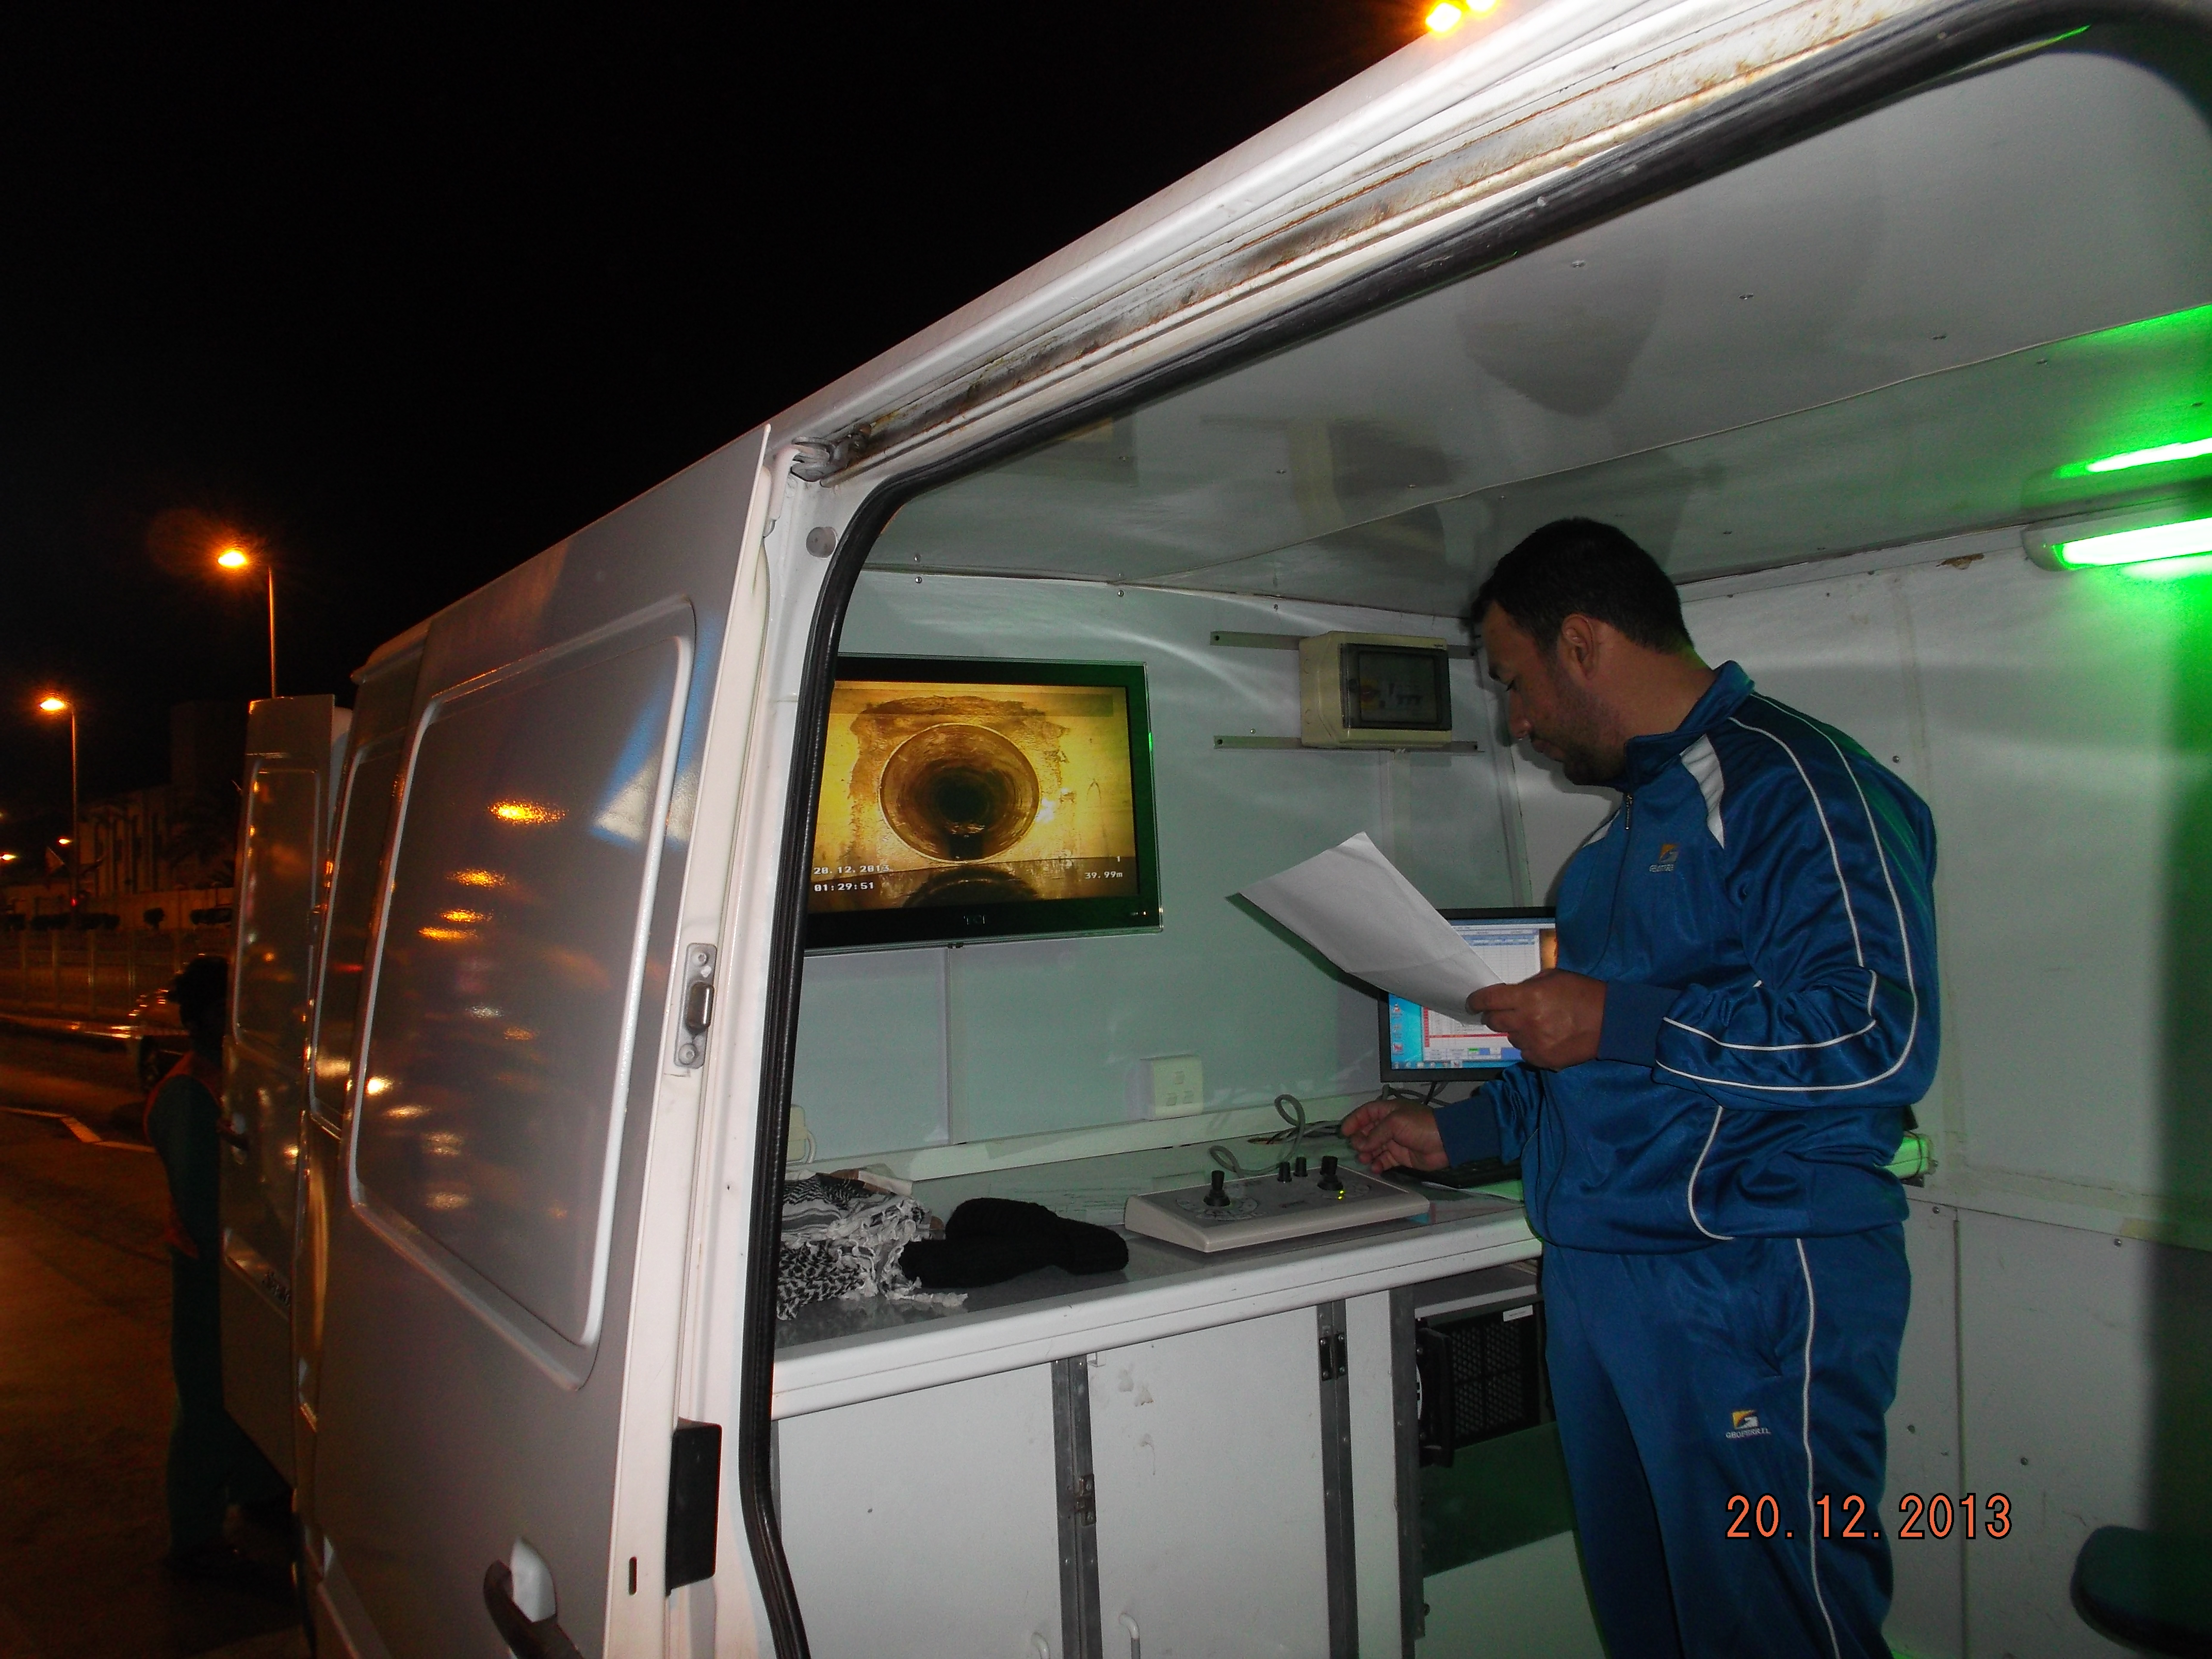 CCTV VAN gudaibiya site